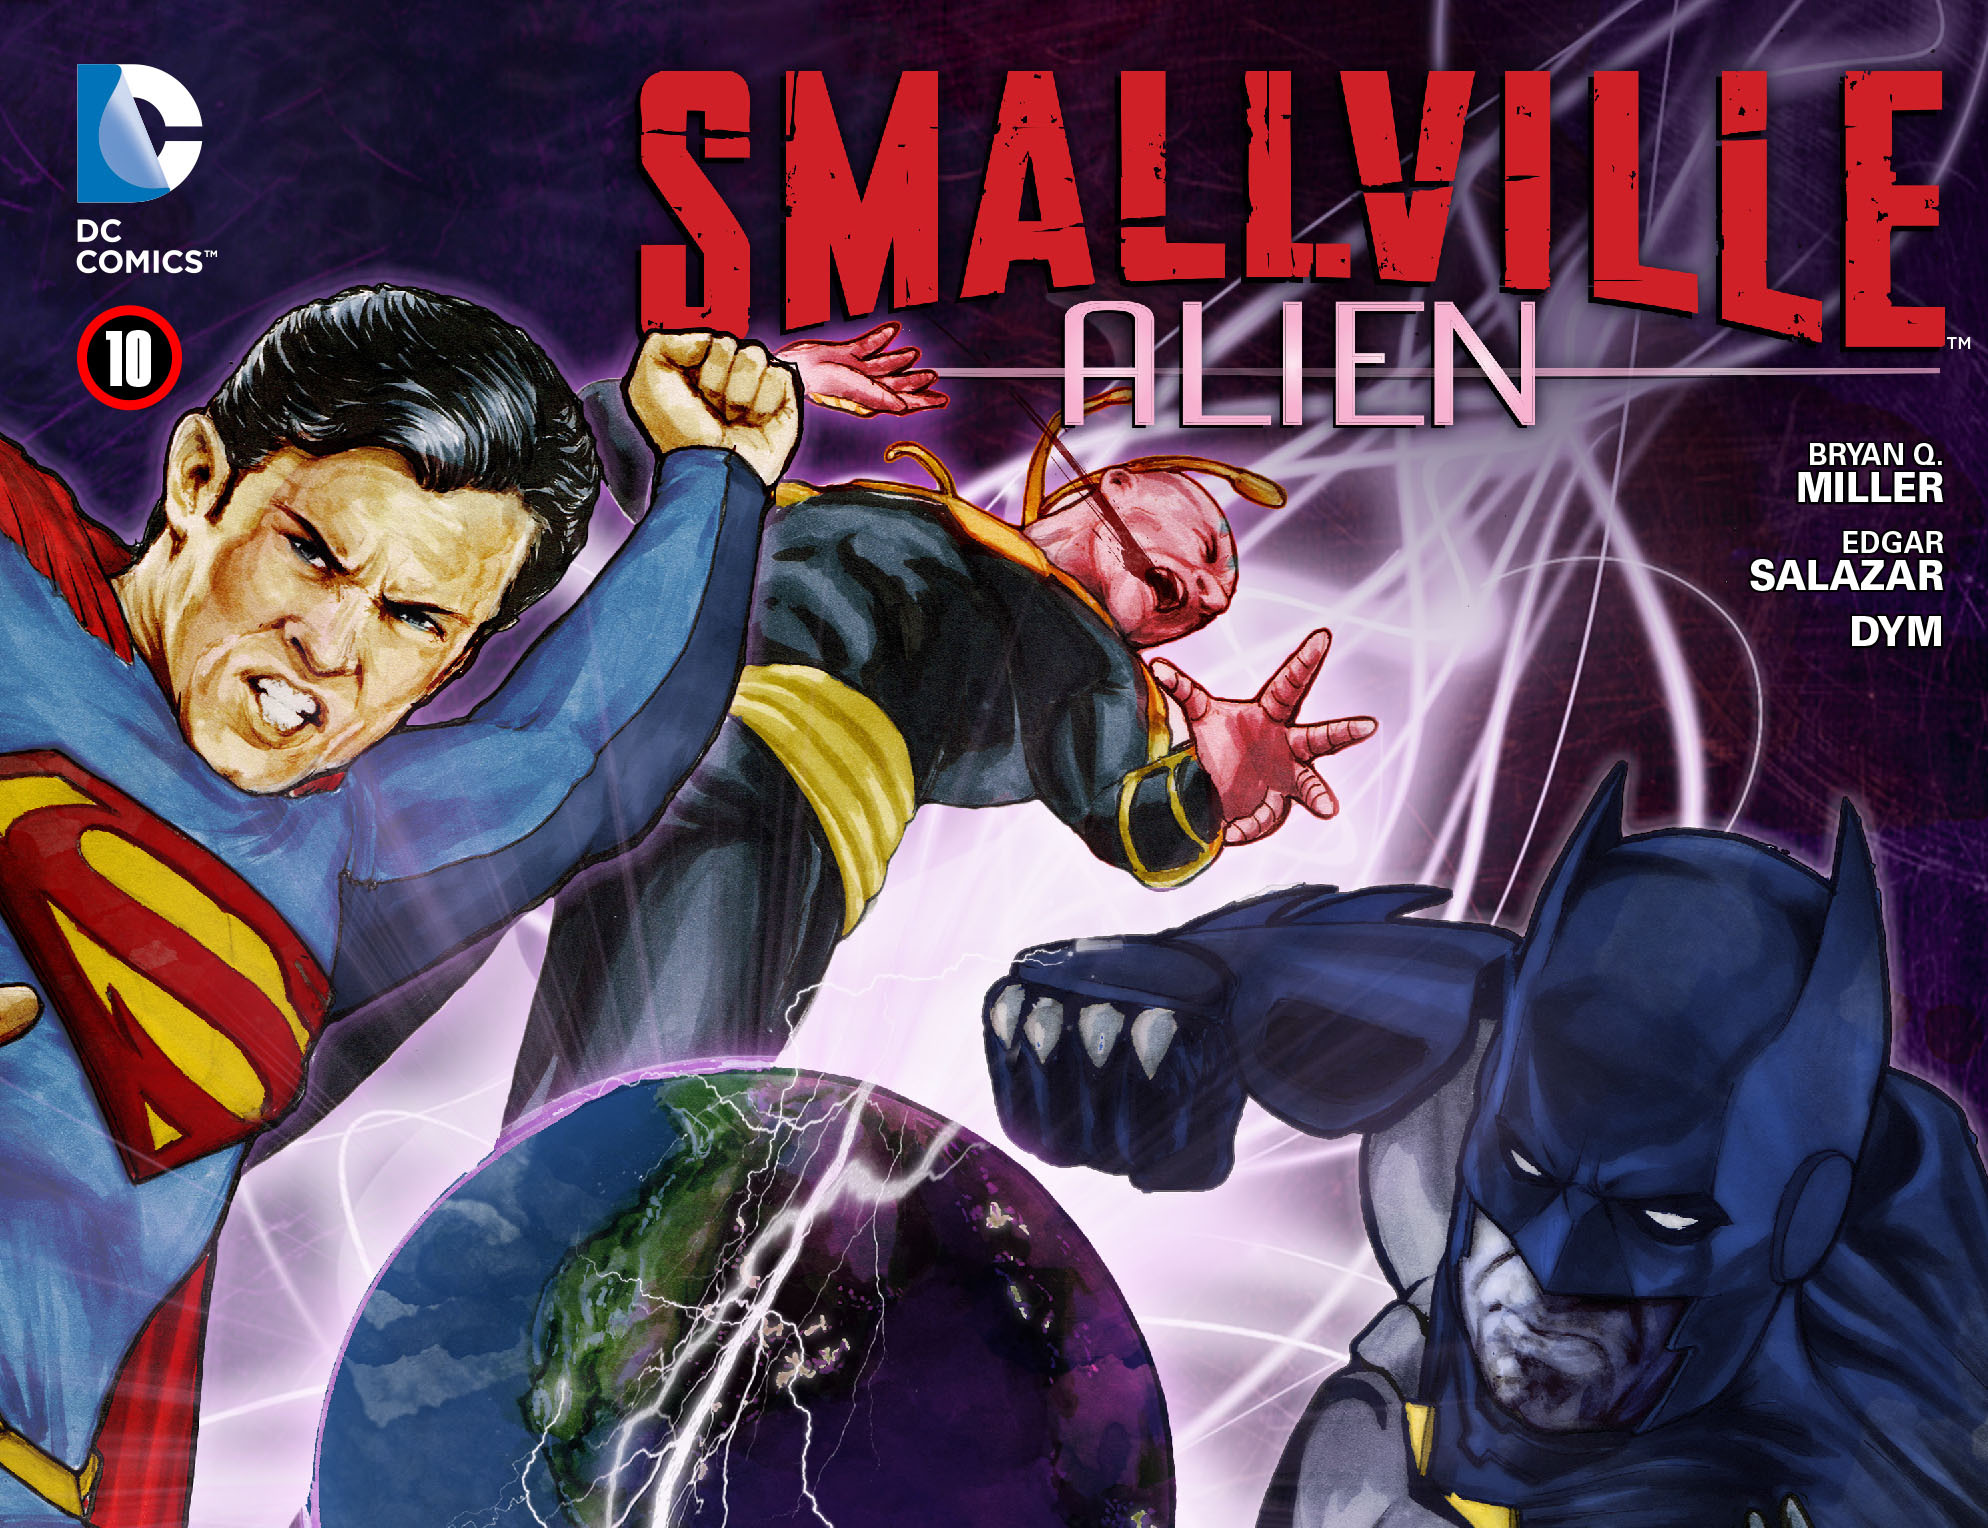 Read online Smallville: Alien comic -  Issue #10 - 1